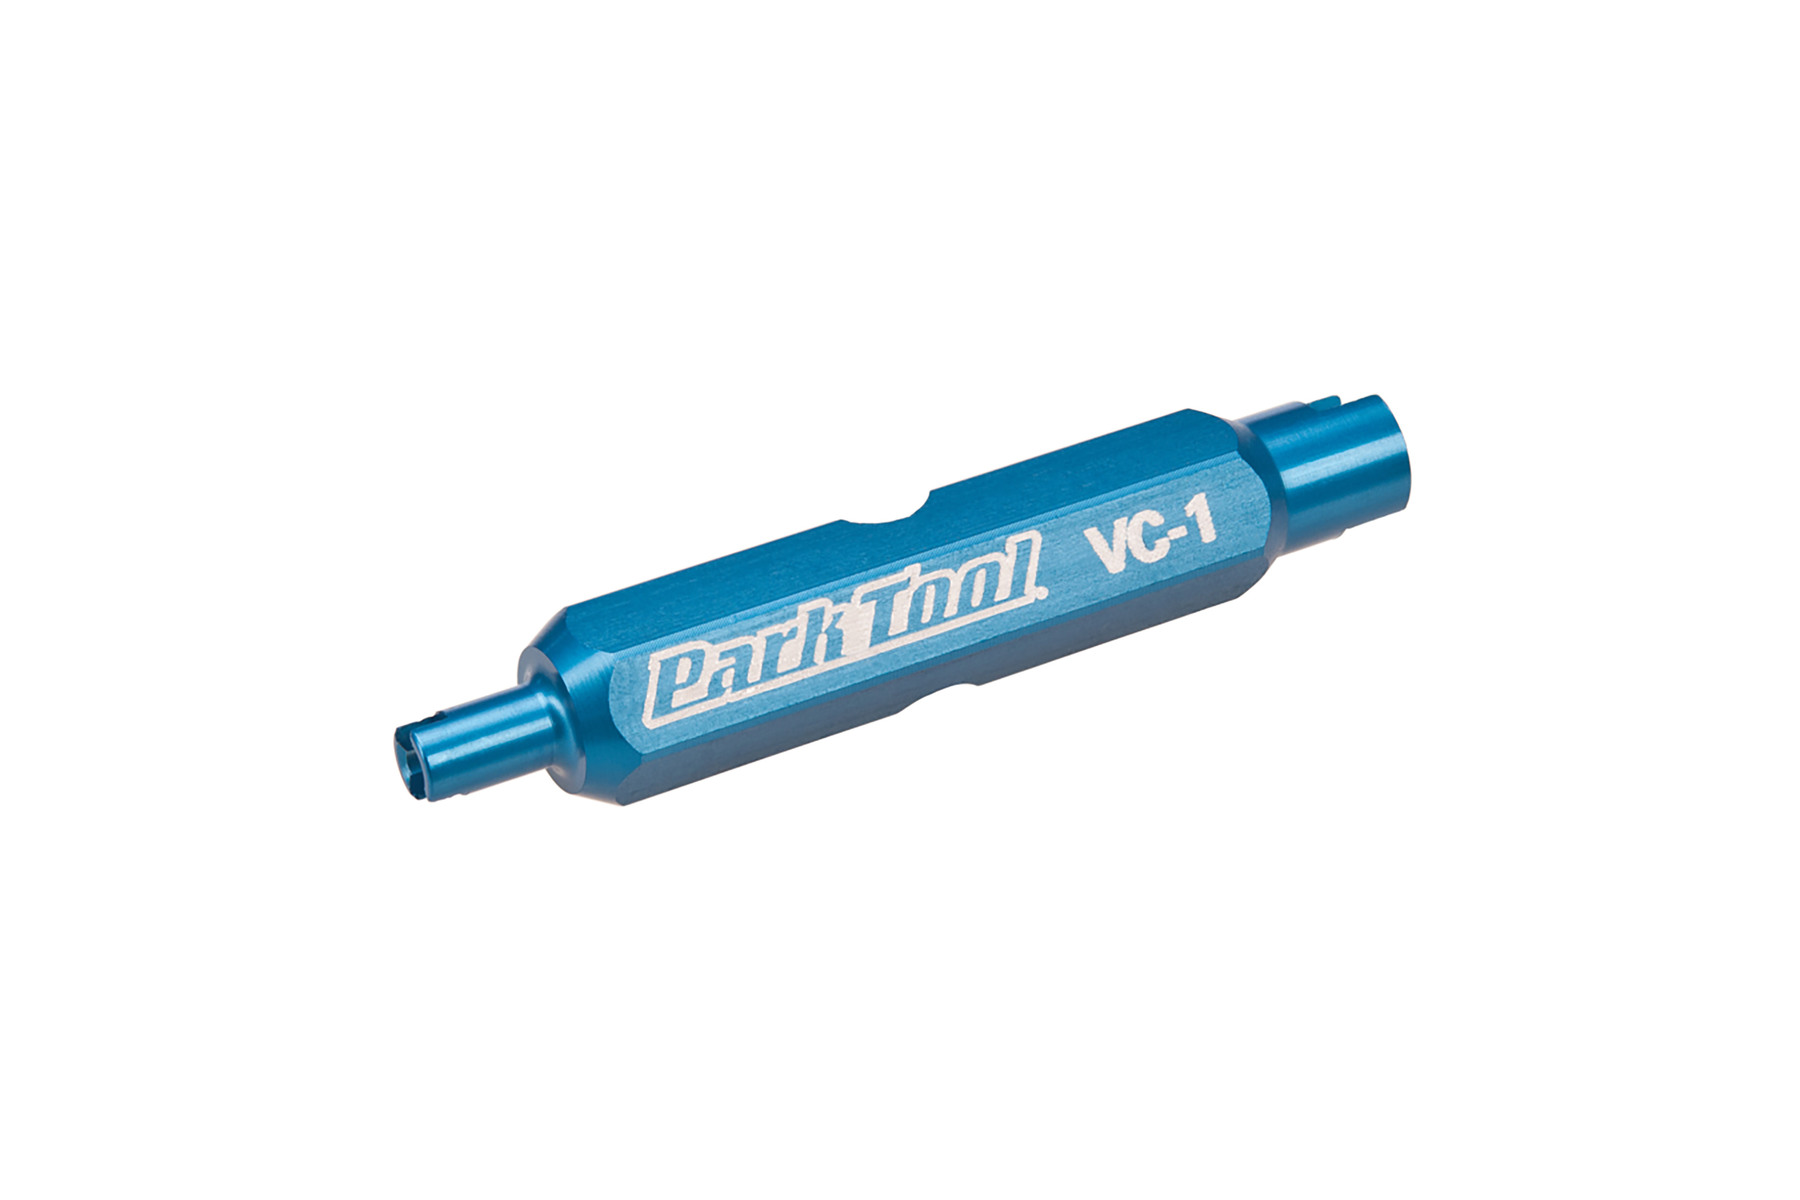 Park Tool VC-1 Ventileinsatz-Schlüssel